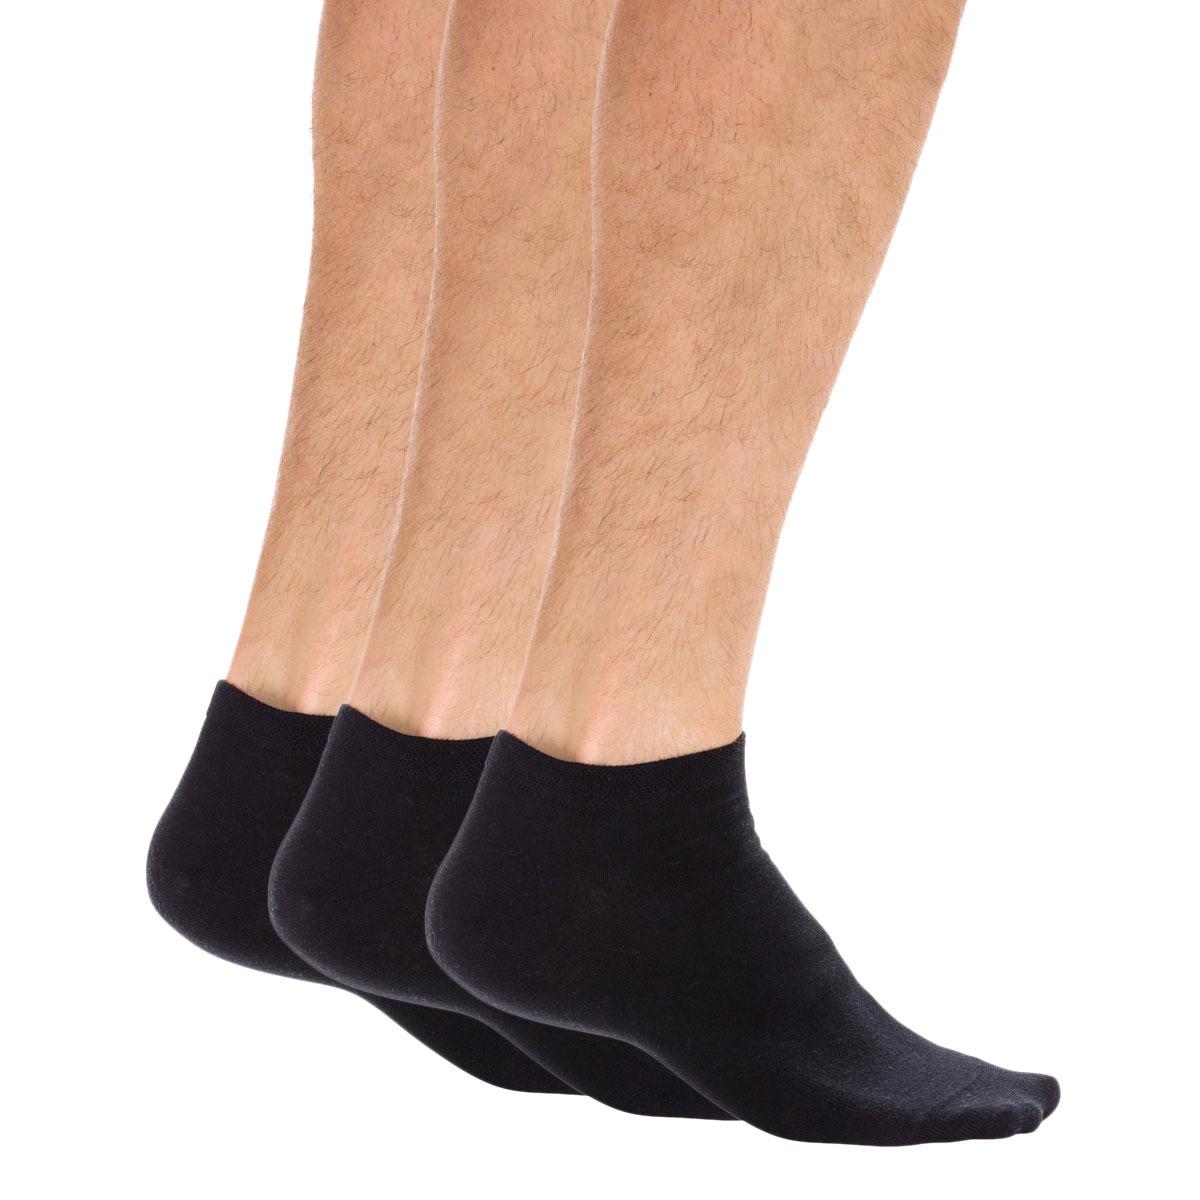 Lot de 3 paires de socquettes invisibles - DIM - Modalova